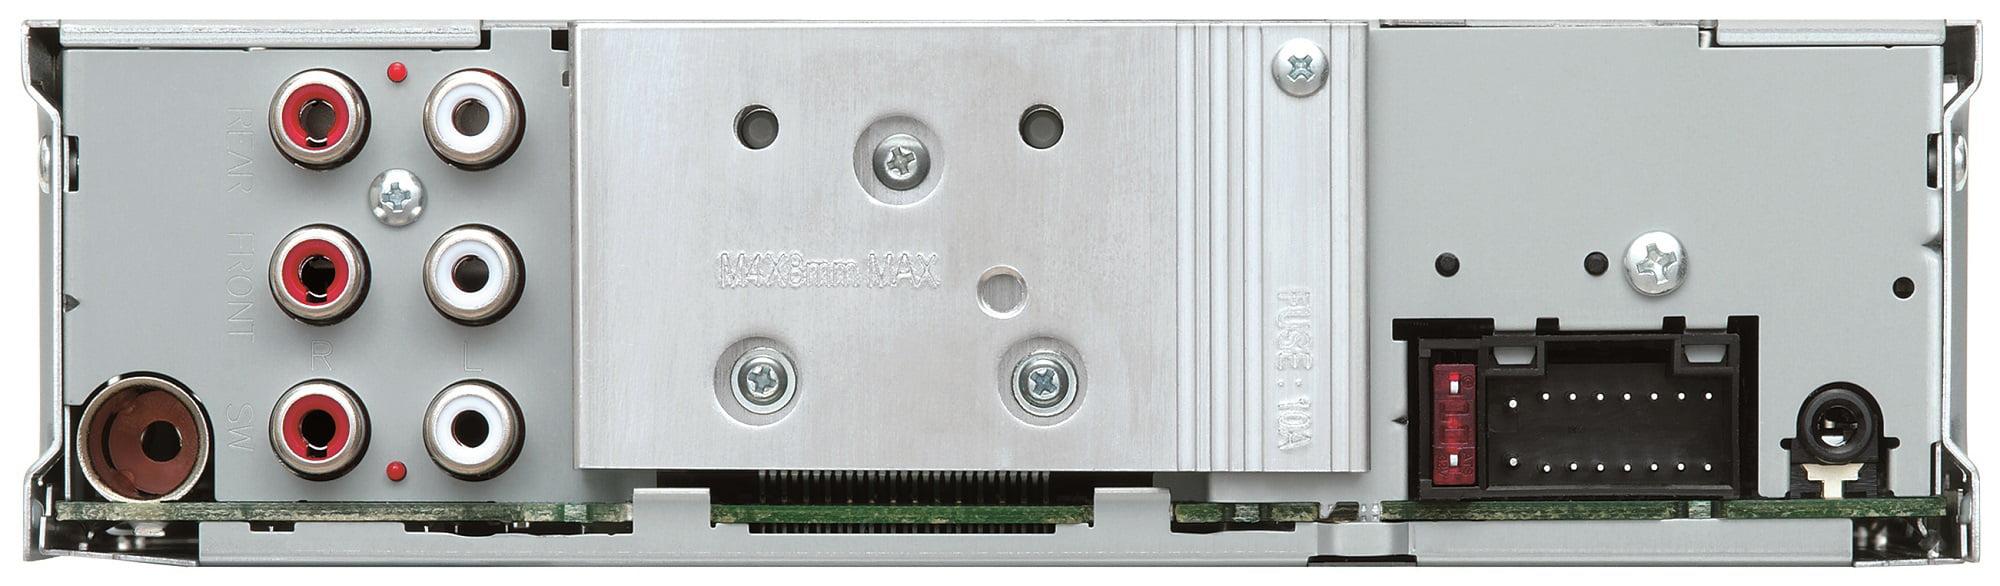 e25001ff fabf 4bf7 ba0a 7be6aa9302c9_1.d890d73e0a2ae4f381c6a6ecab062950 kenwood kdc bt330u in dash am fm cd receiver with built in kenwood kdc 210u wiring diagram at sewacar.co